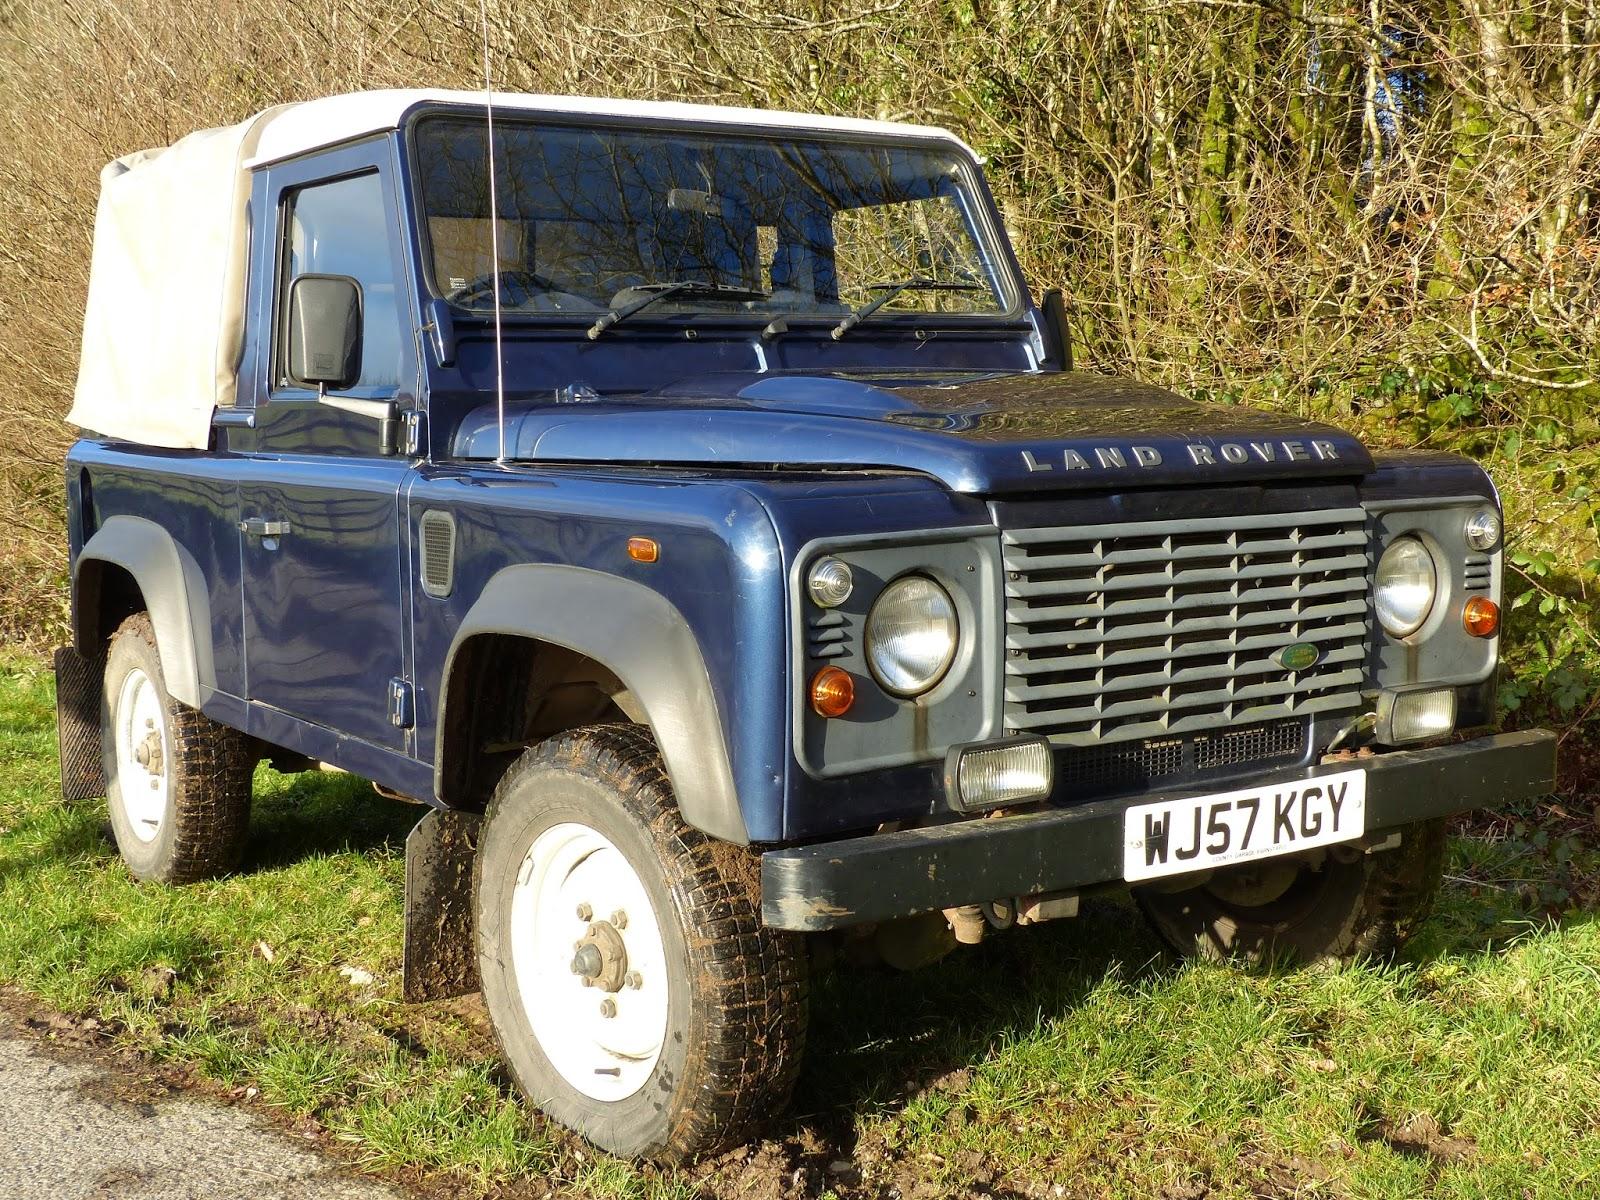 Rockley Farm 2008 Land Rover Defender For Sale